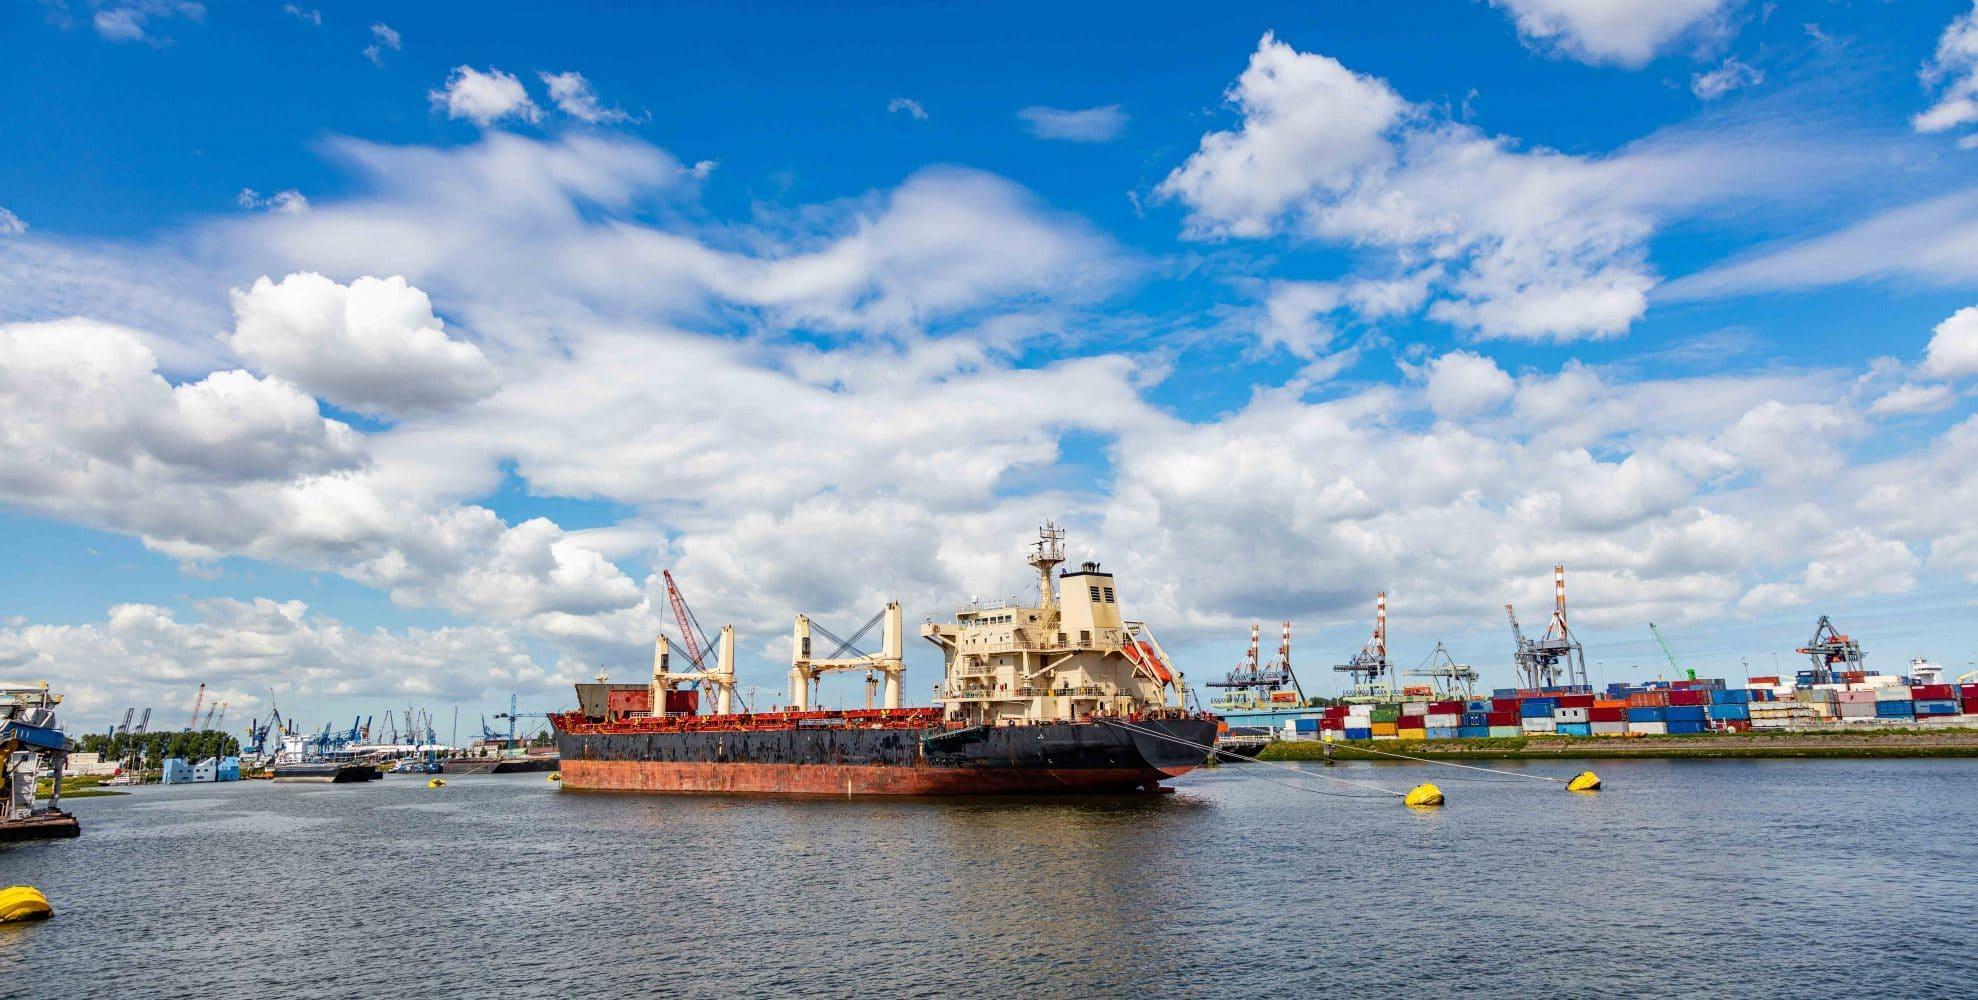 RPS-artikel-monstercampagne-havenbedrijf-rotterdam-havengebied